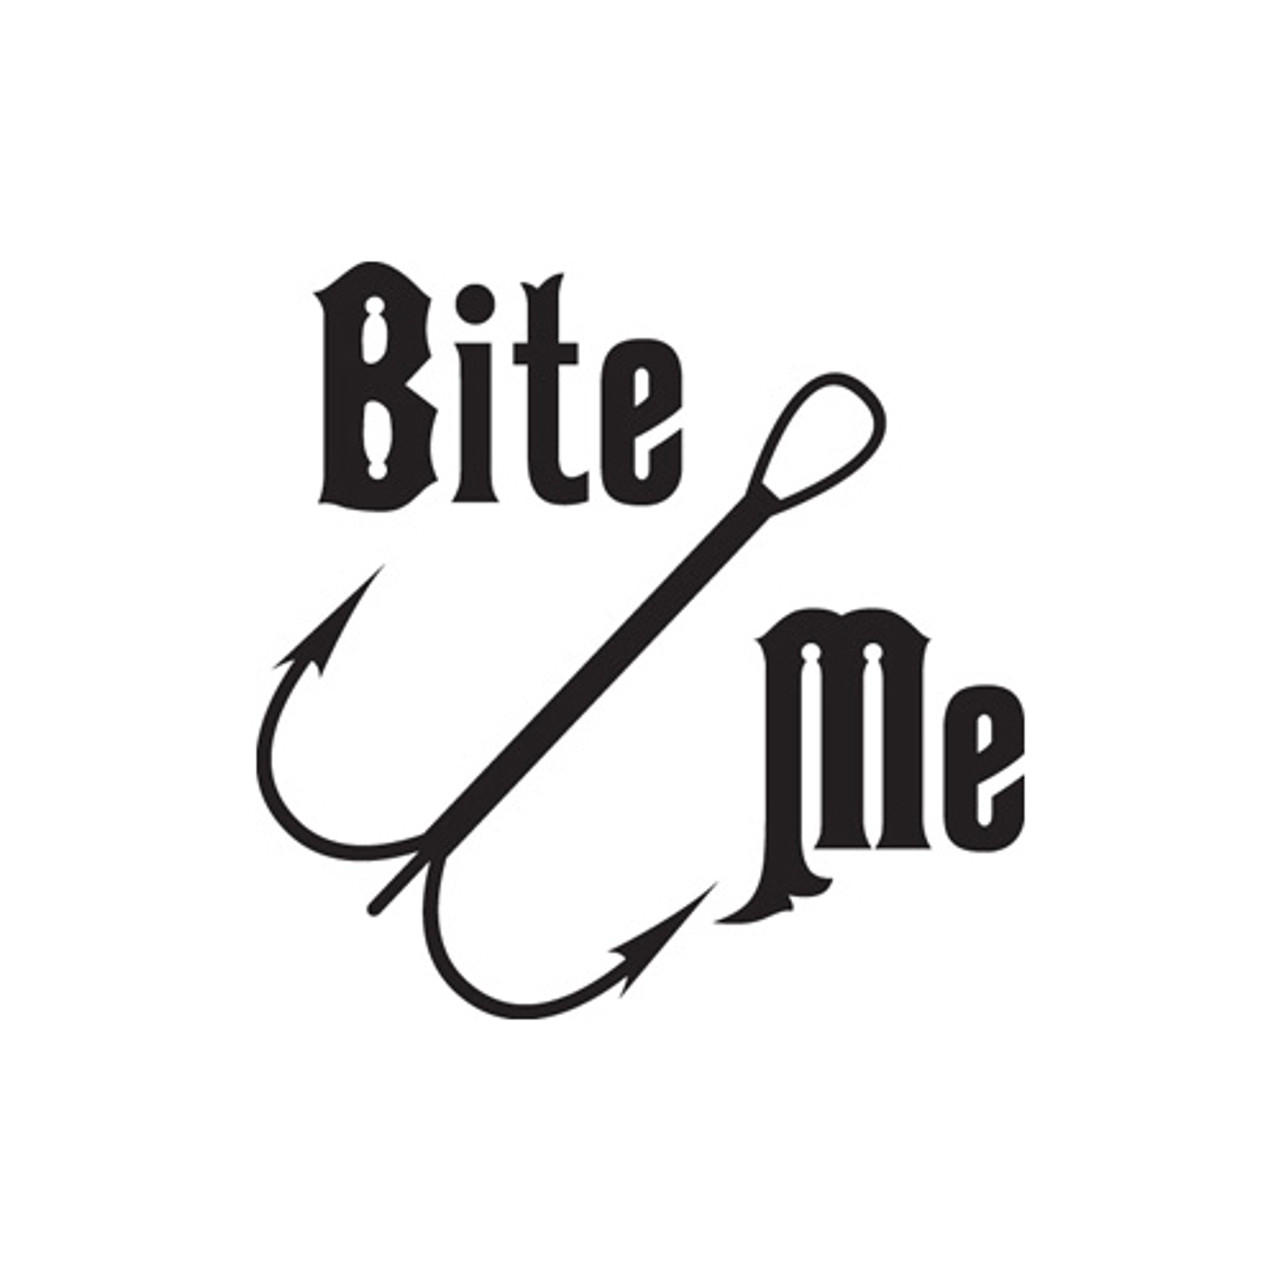 Bite Me Car Sticker Decal Graphic Vinyl Label  White